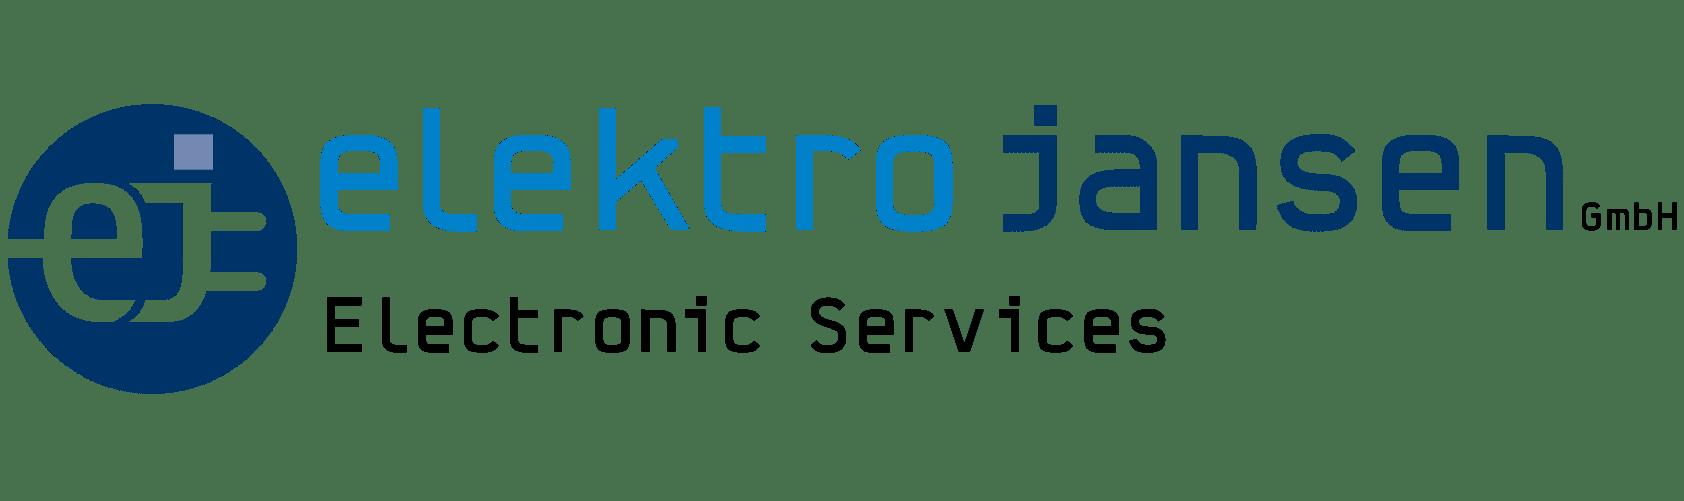 Elektro Jansen GmbH